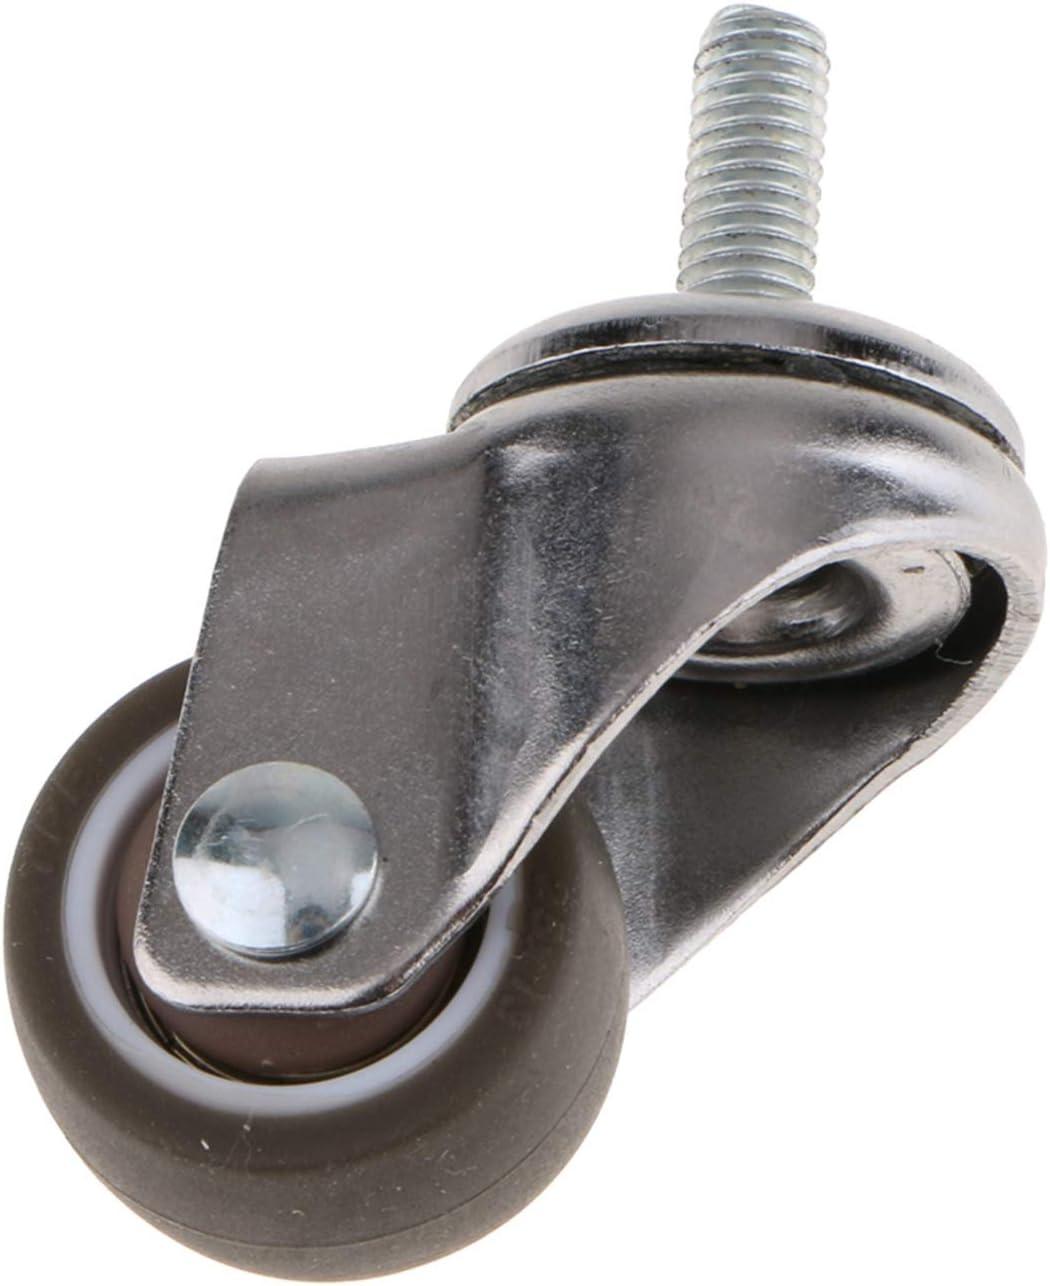 Office Chair Max 79% OFF Casters Heavy Duty Furn Rubber Trolley Los Angeles Mall Wheel Castor